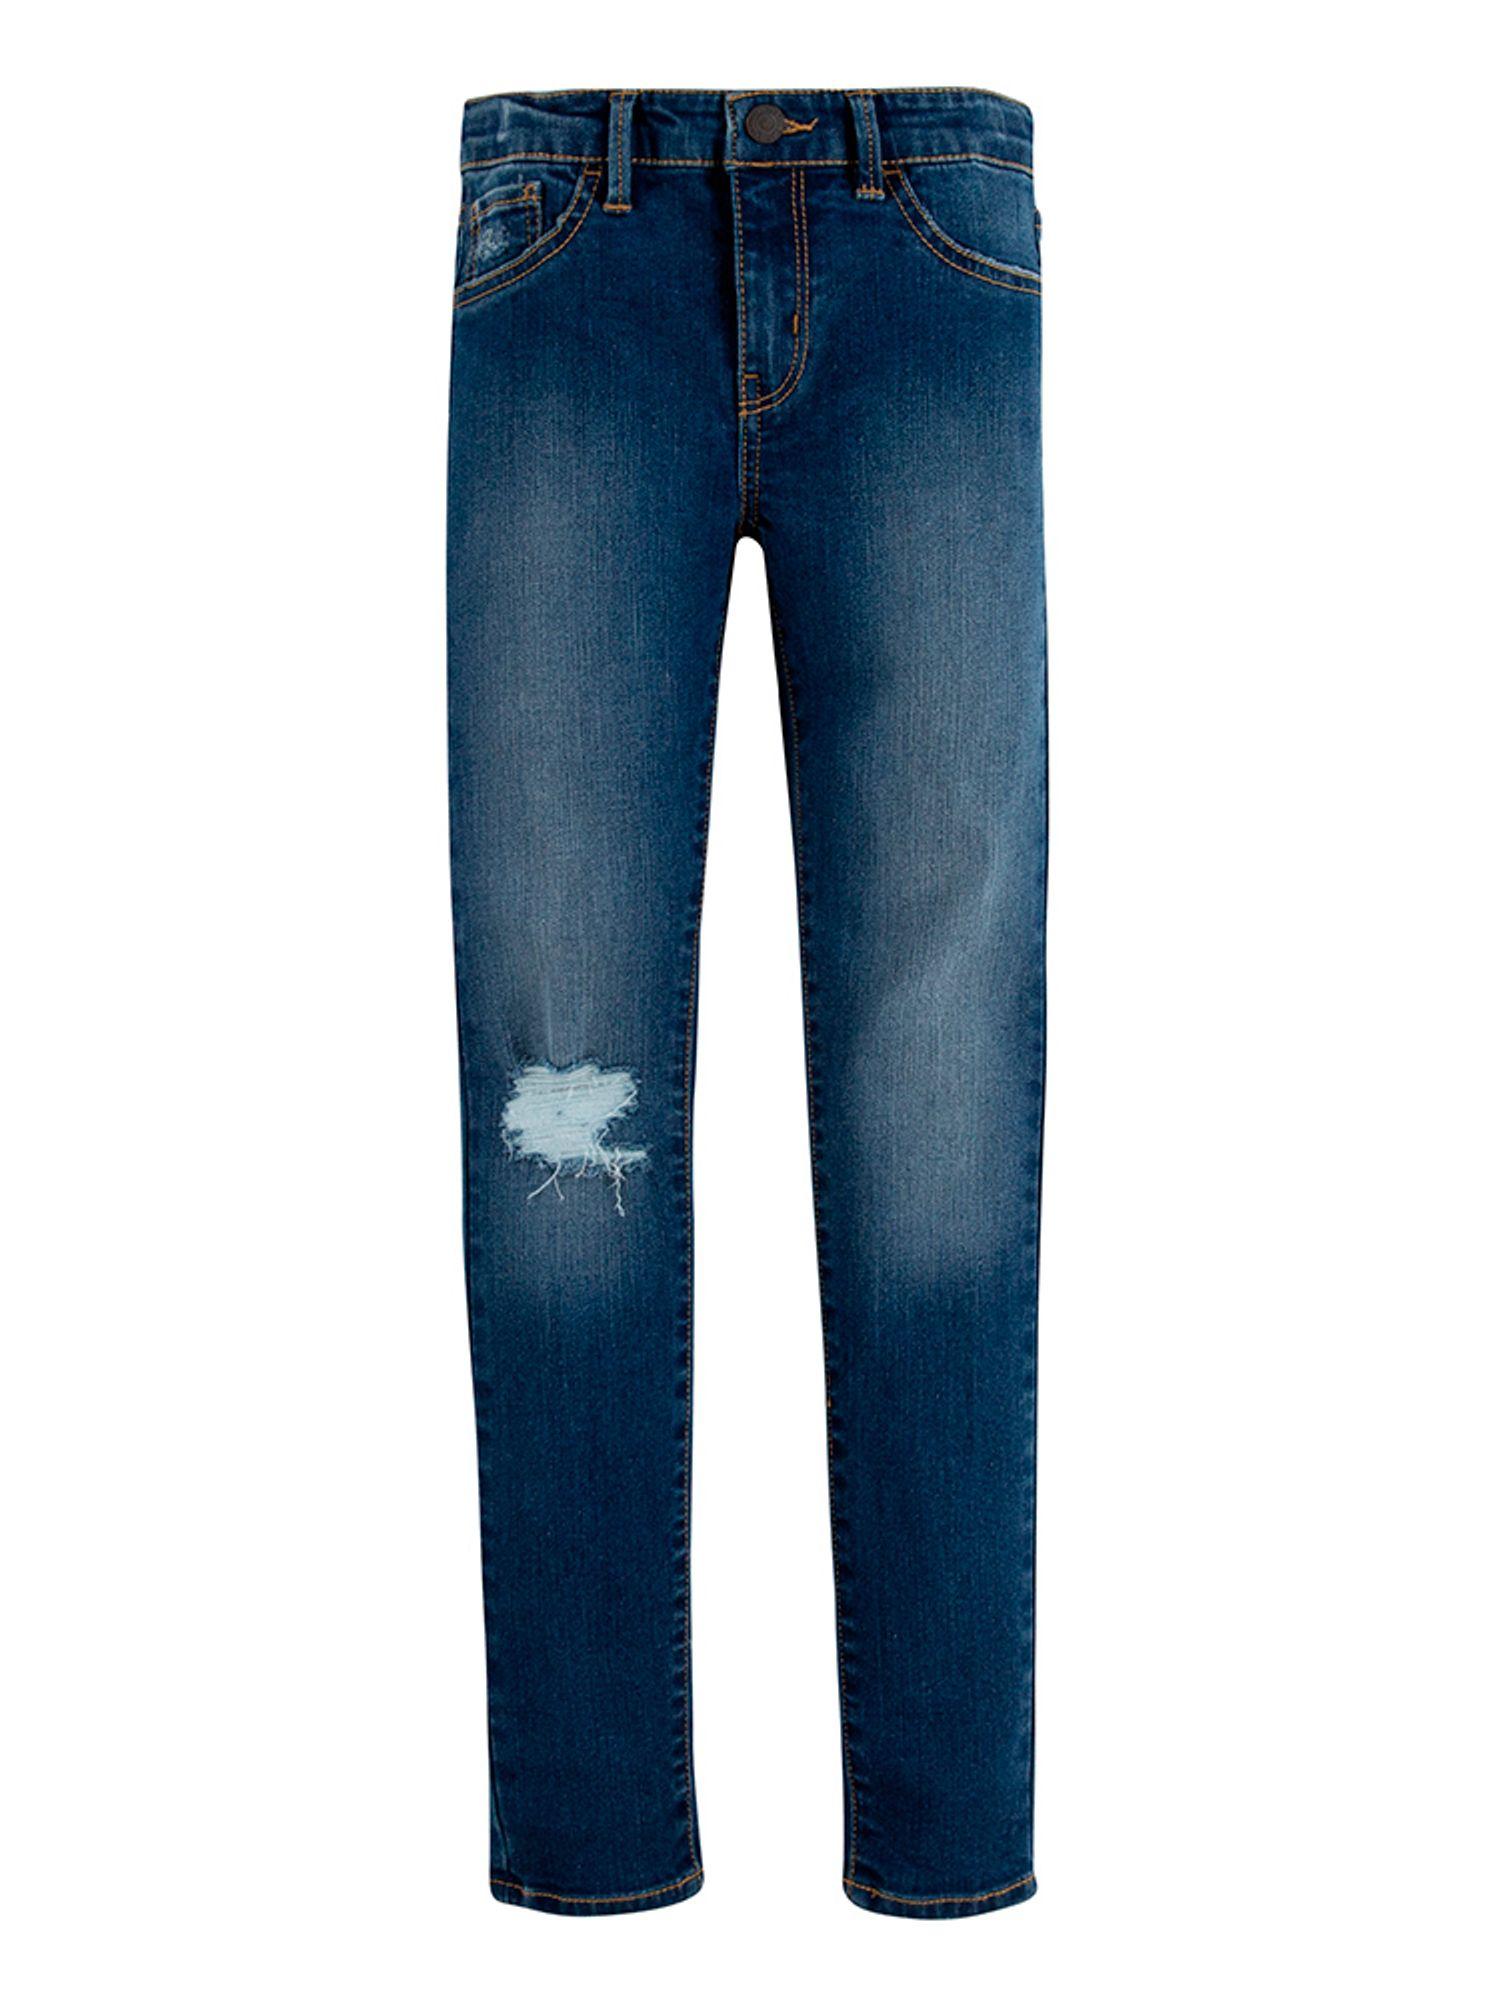 710_Super_Skinny_Fit_Jeans_West_Third_-7-16_años-_1